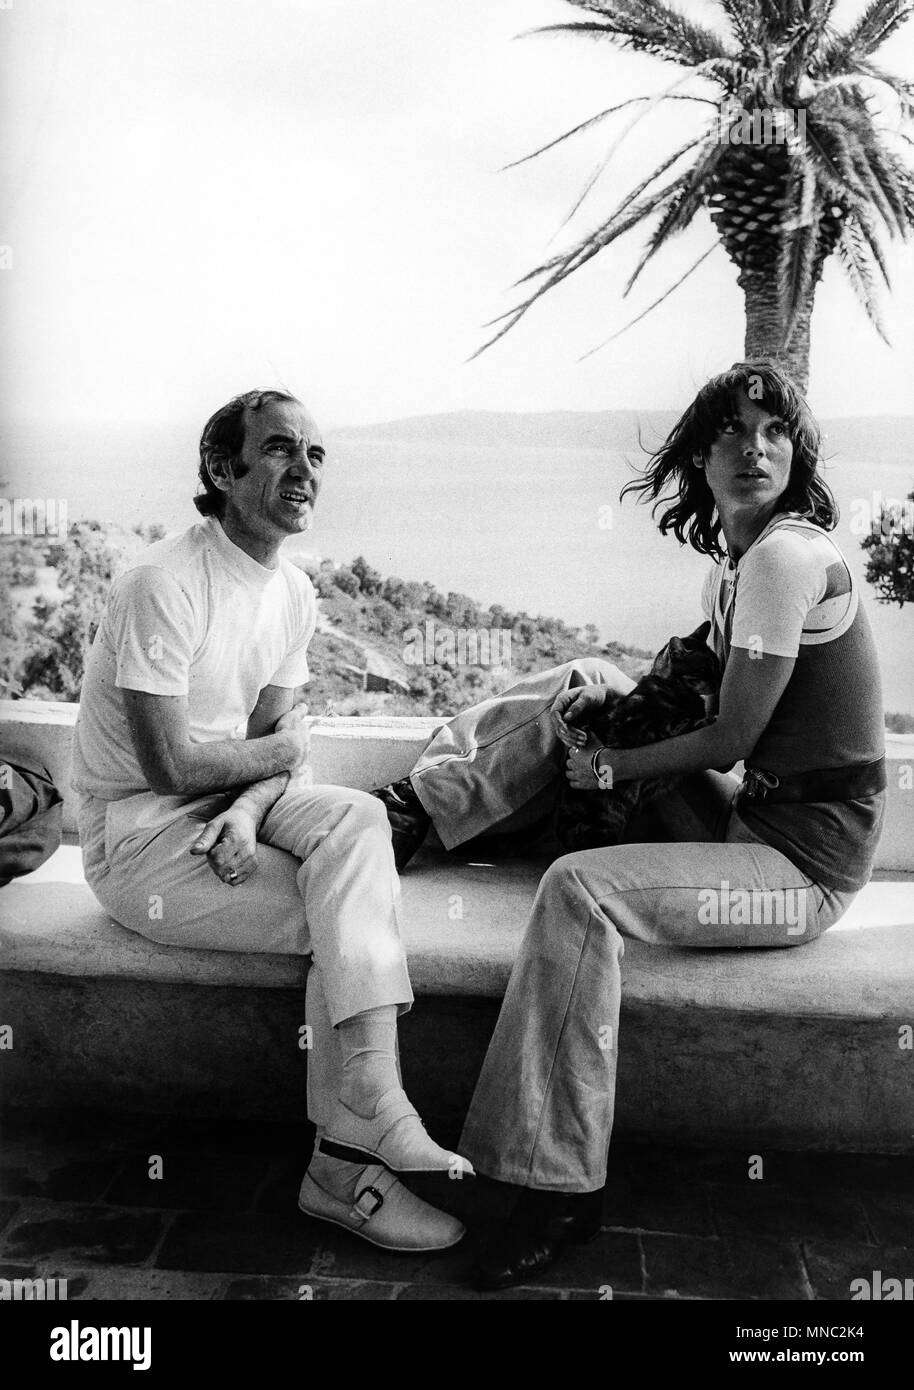 Tammy Clarkson,Michelle van Eimeren (b. 1972) XXX movies Jackie Richardson,Rajini